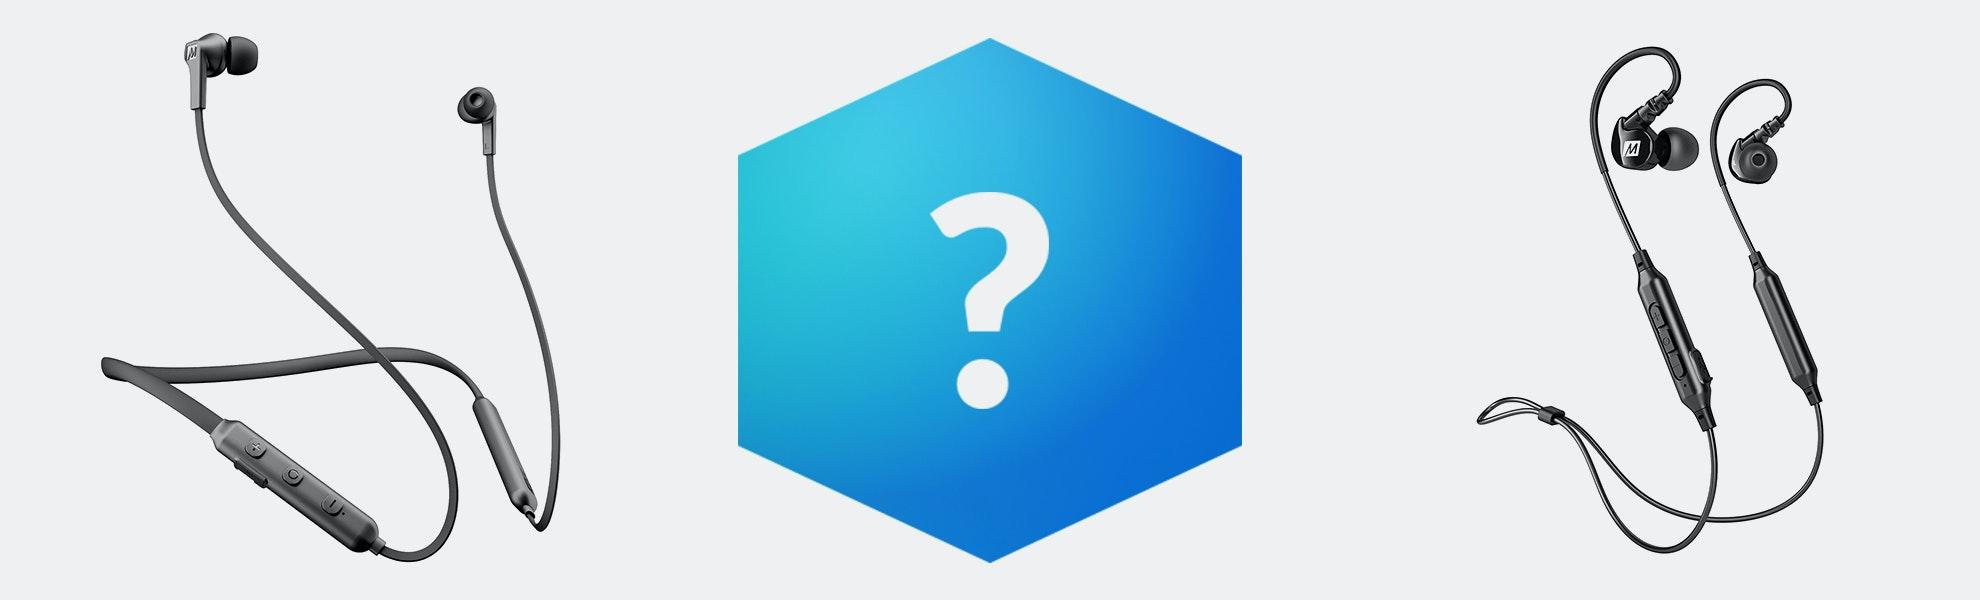 Massdrop Blue Box: MEE Audio Bluetooth IEMs